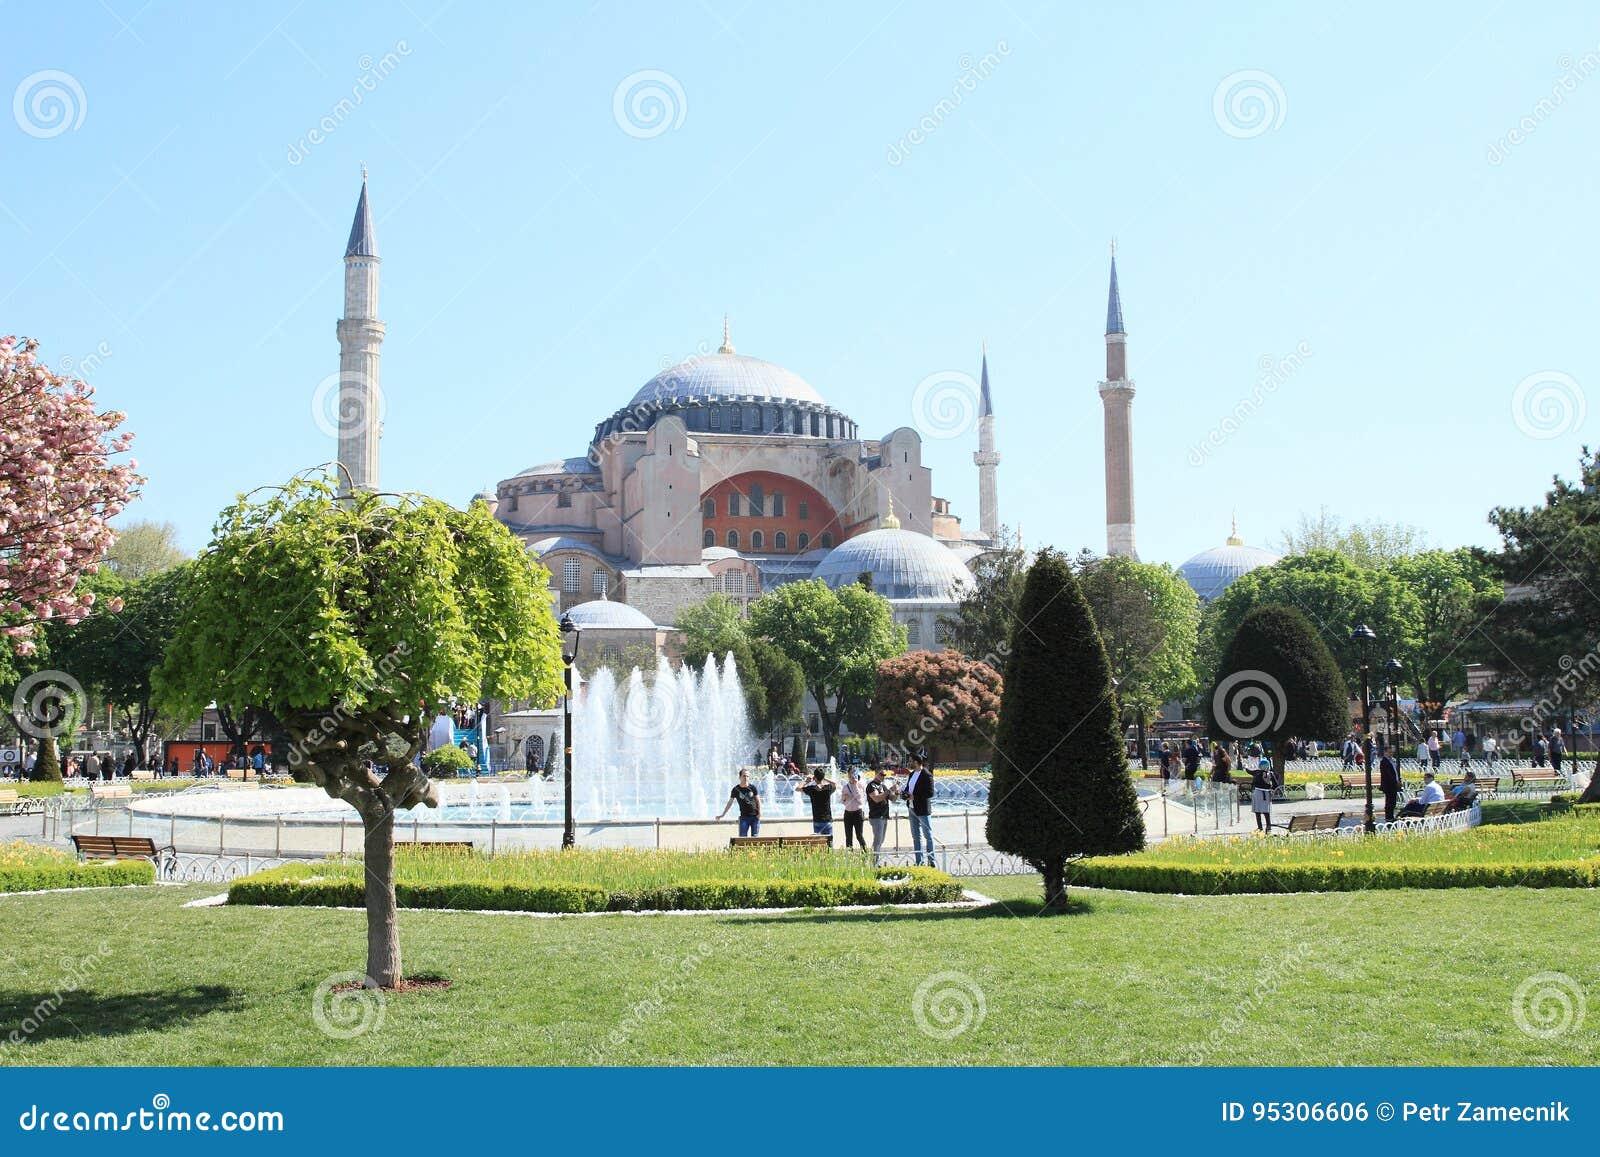 Hagia Sofia and Sultanahmed Arkeolojik Park in Istanbul